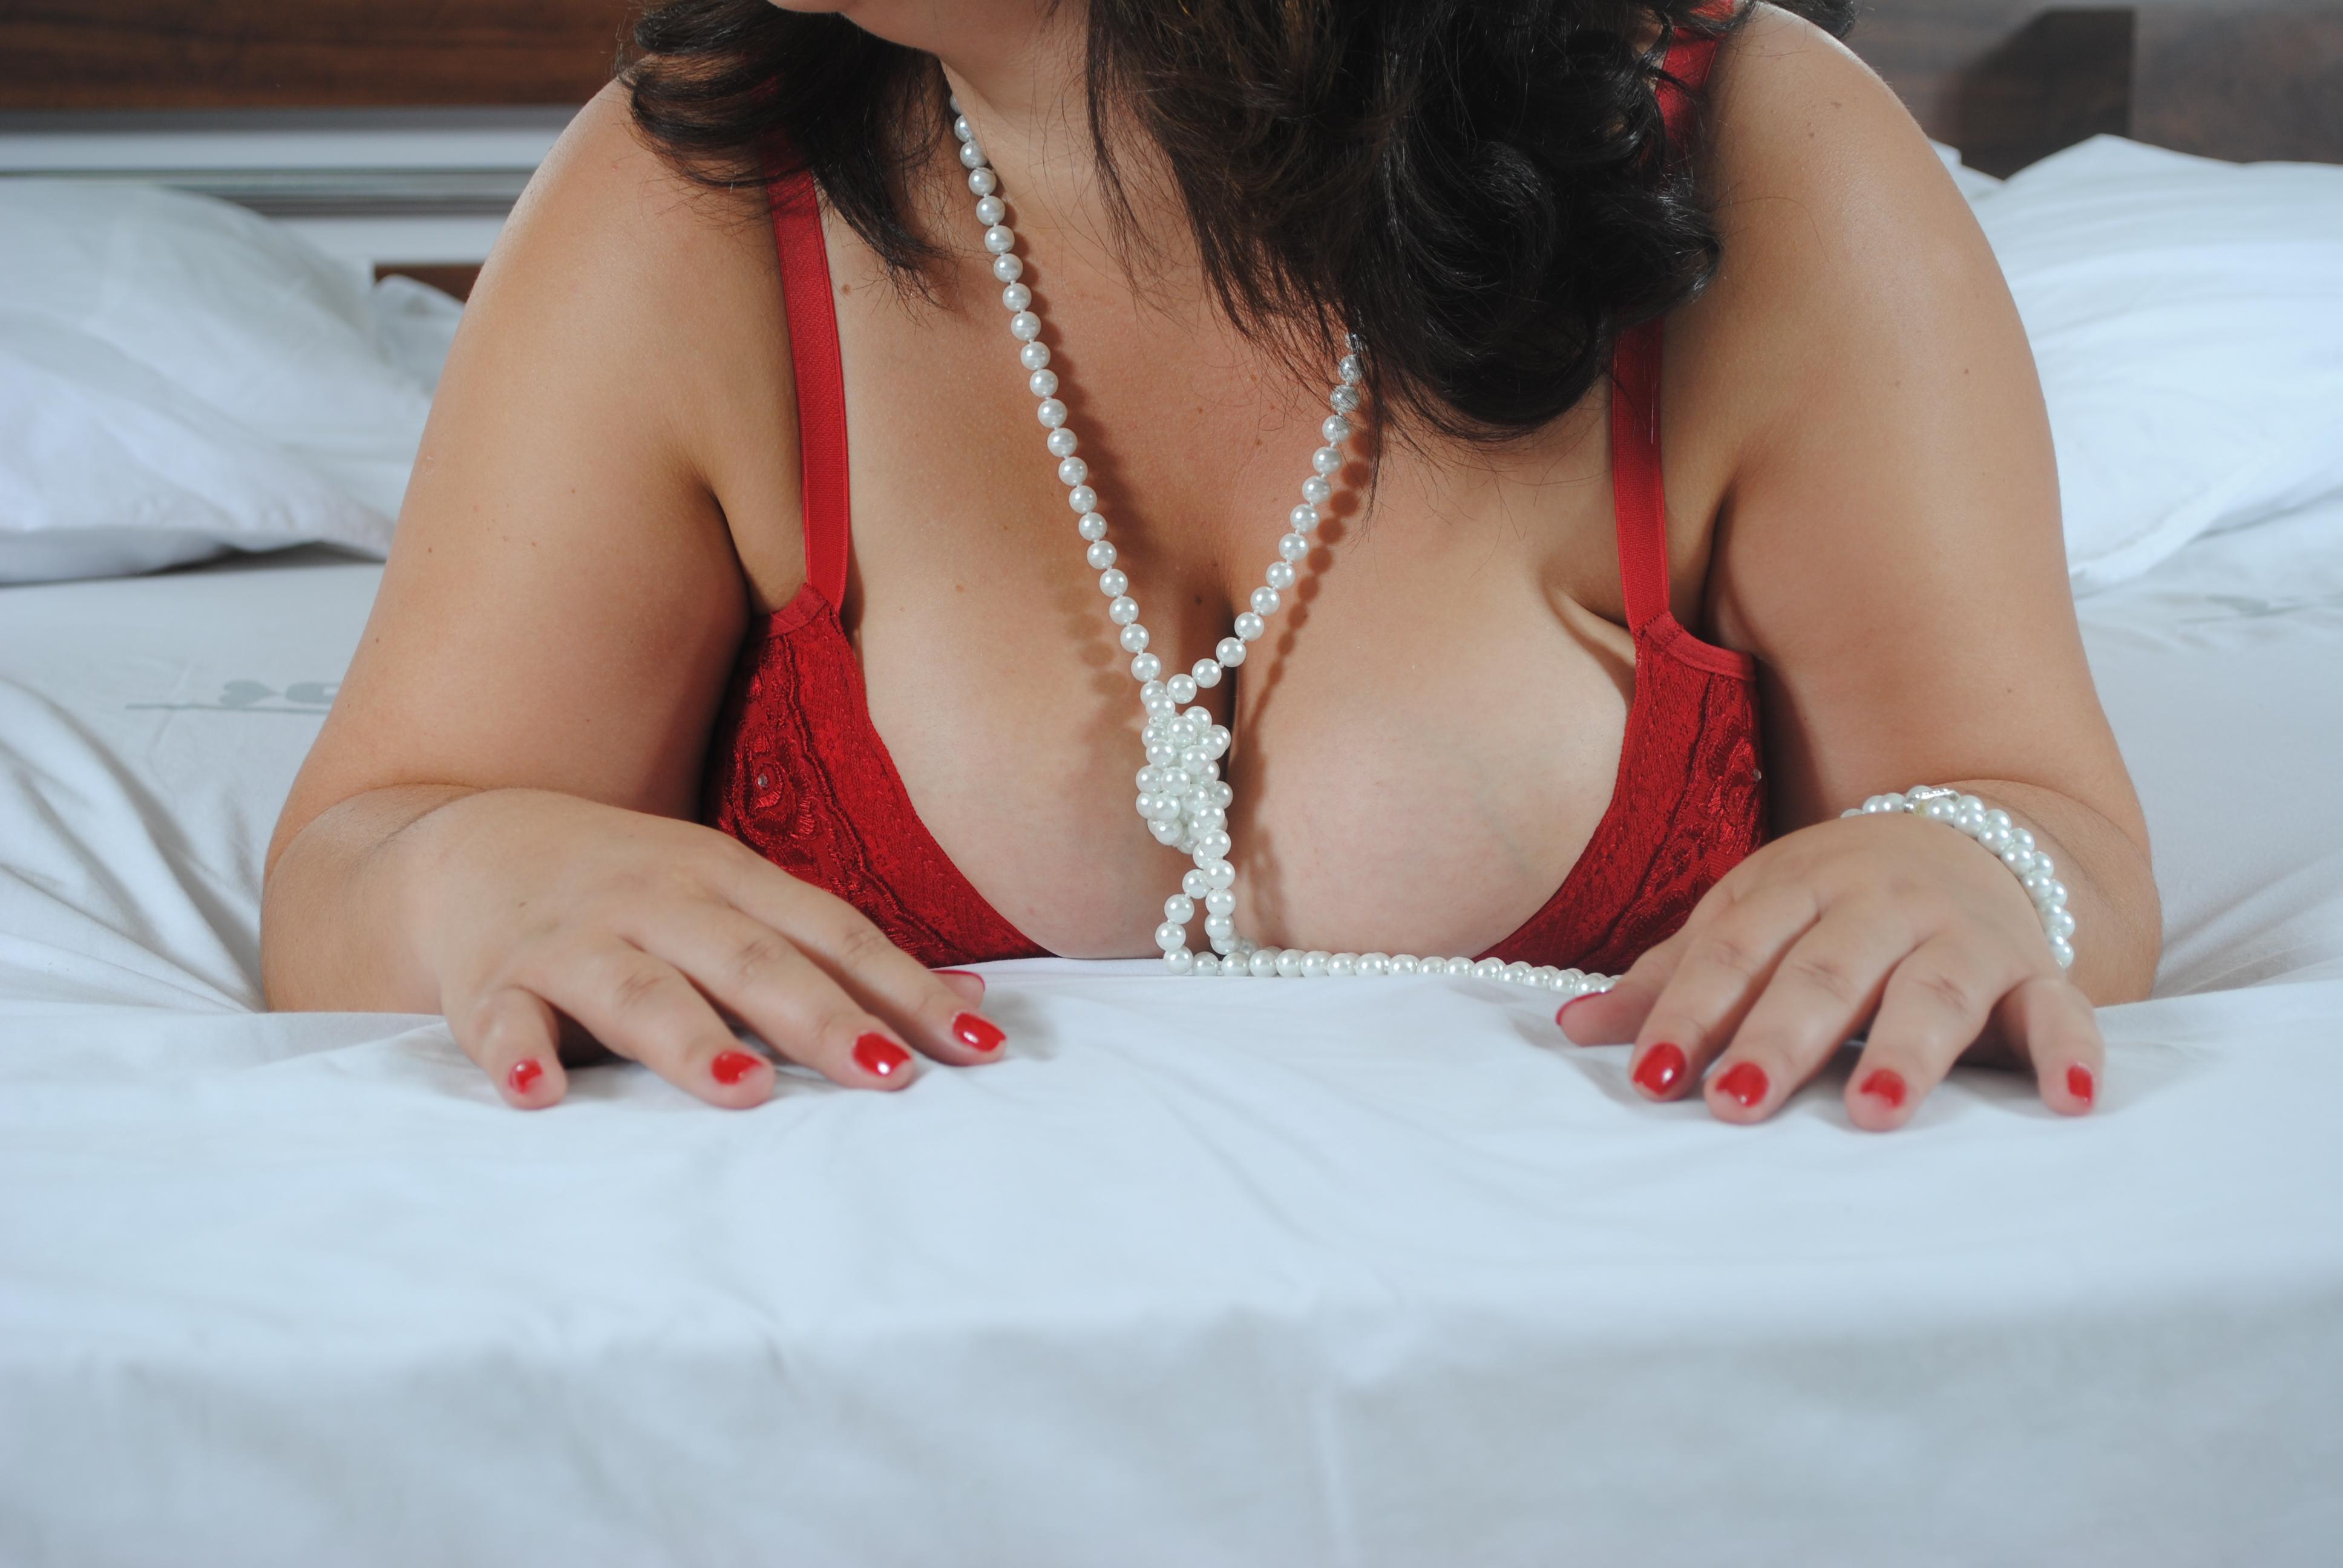 sensual massage erotic sex clubs in sao paulo